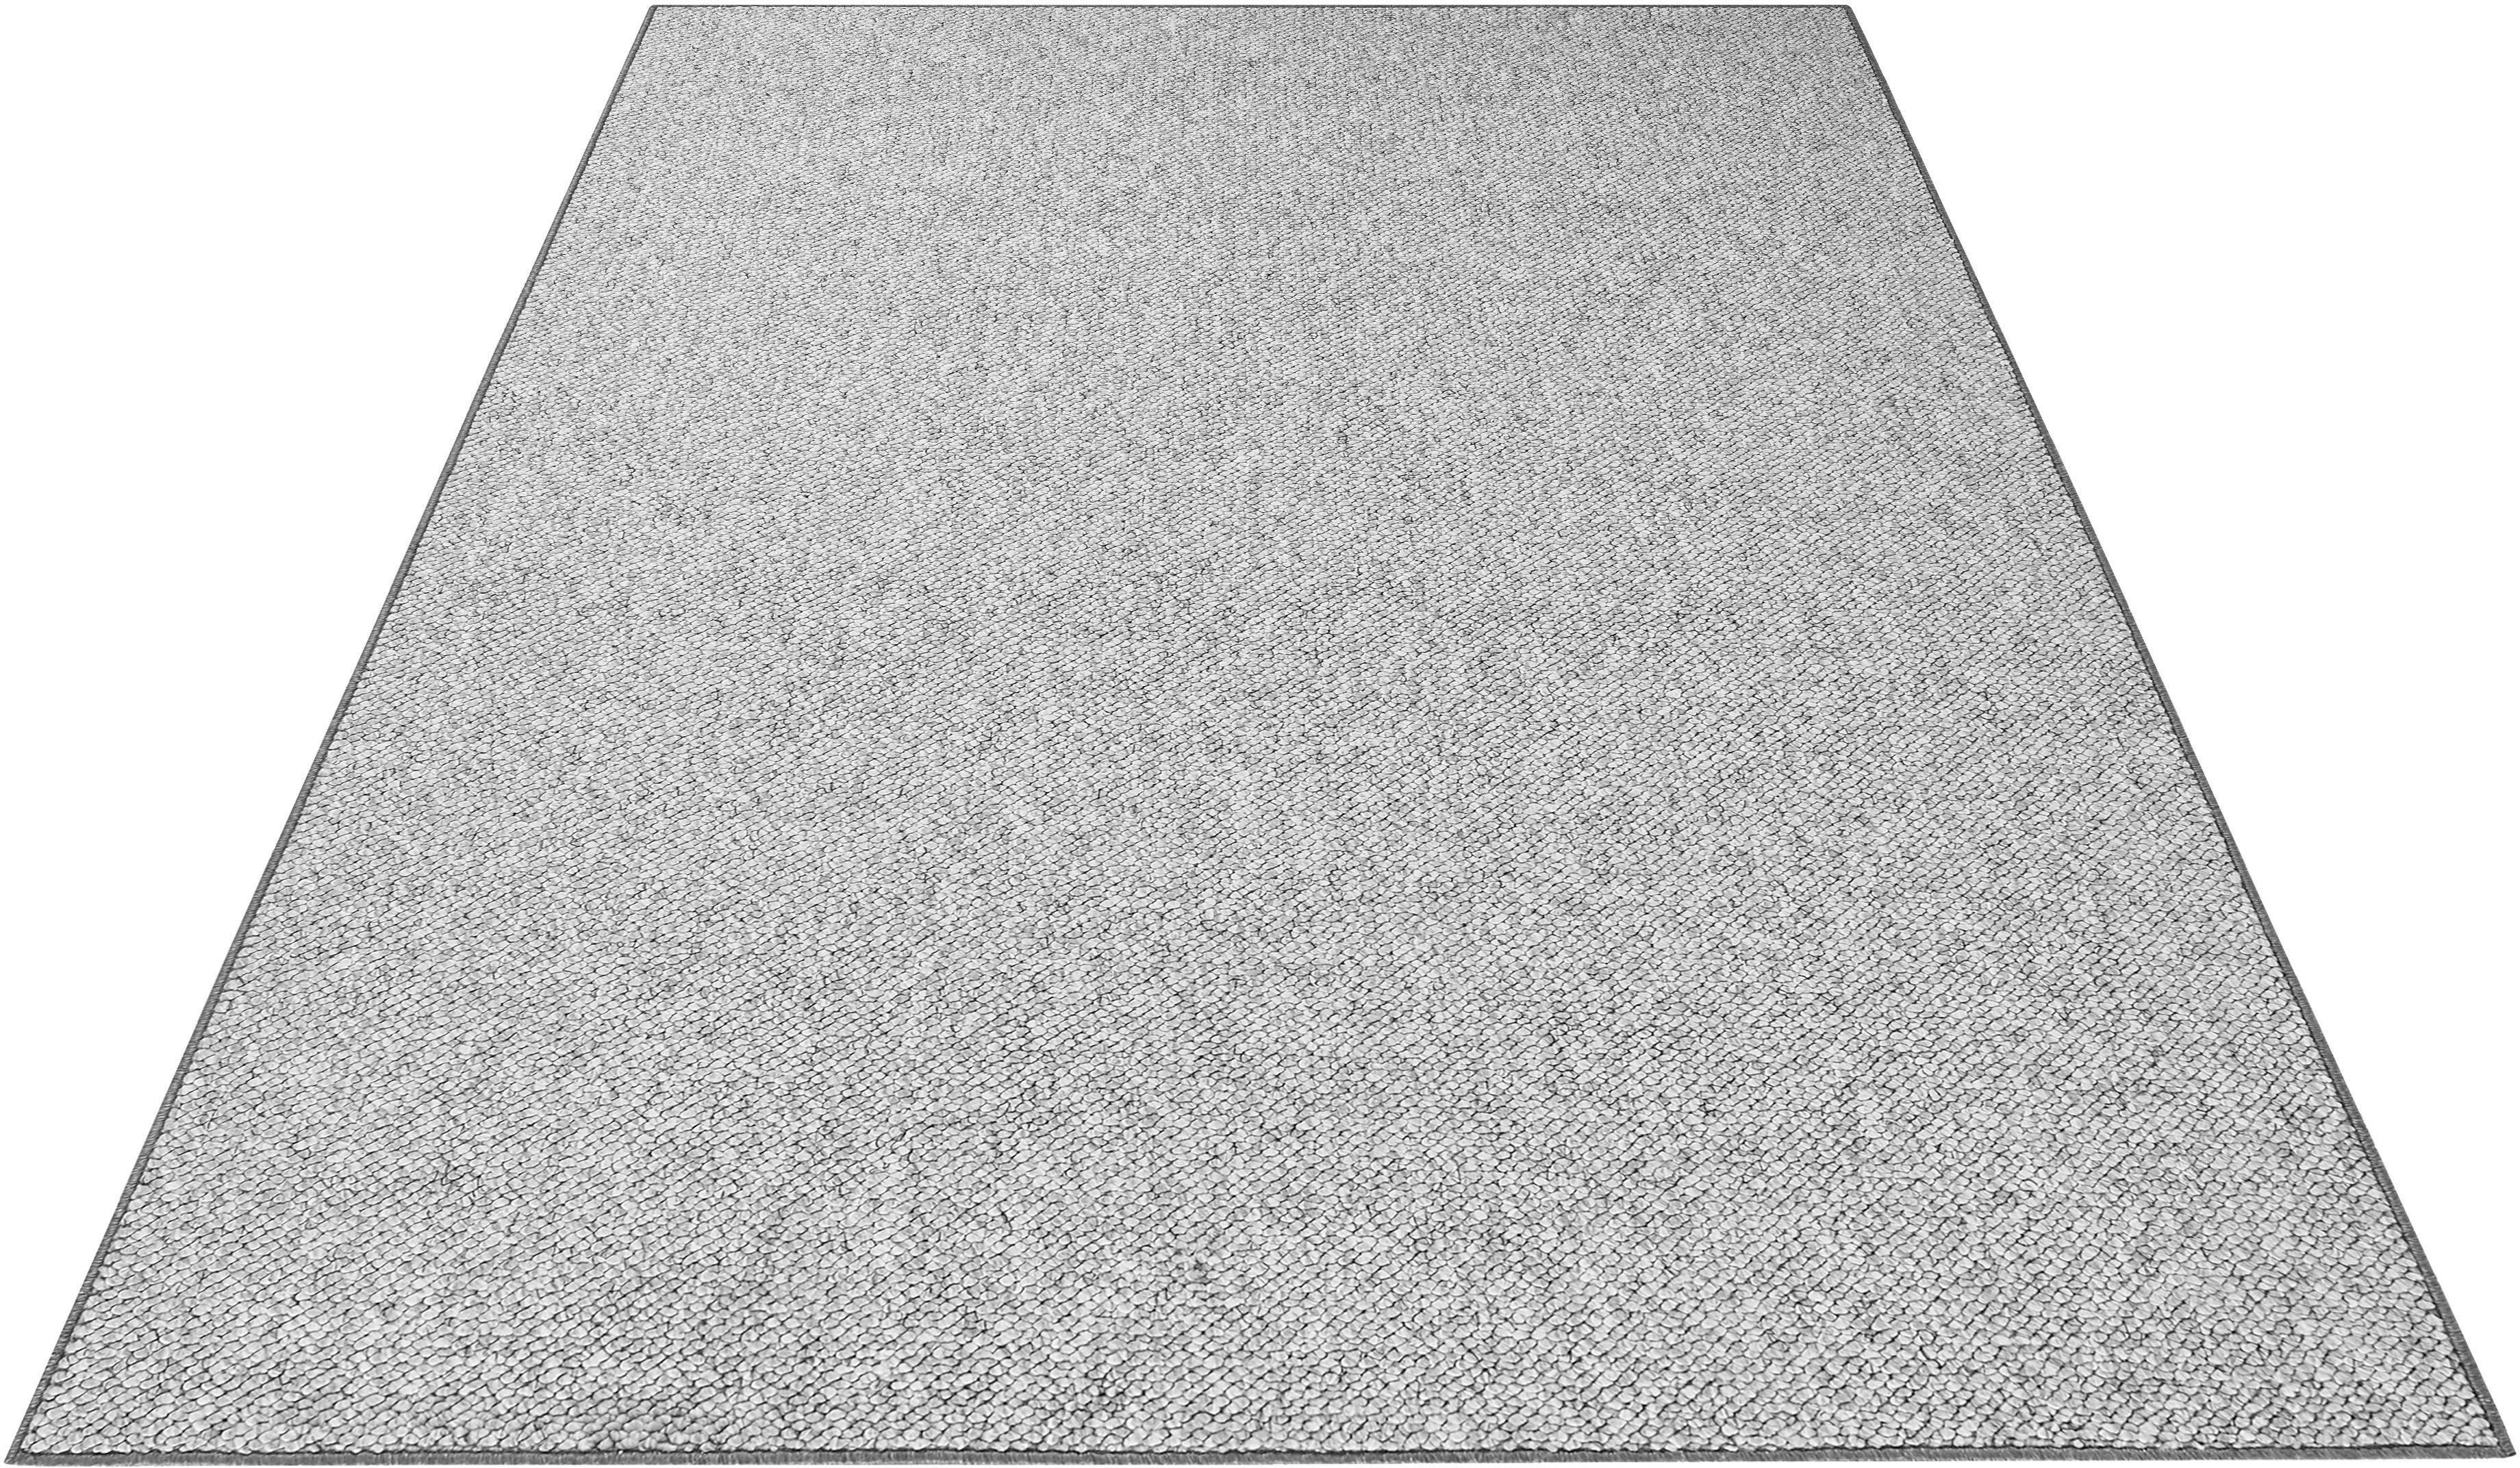 BT Carpet vloerkleed Wolly 2 Wol-look, reliëfeffect, woonkamer - verschillende betaalmethodes